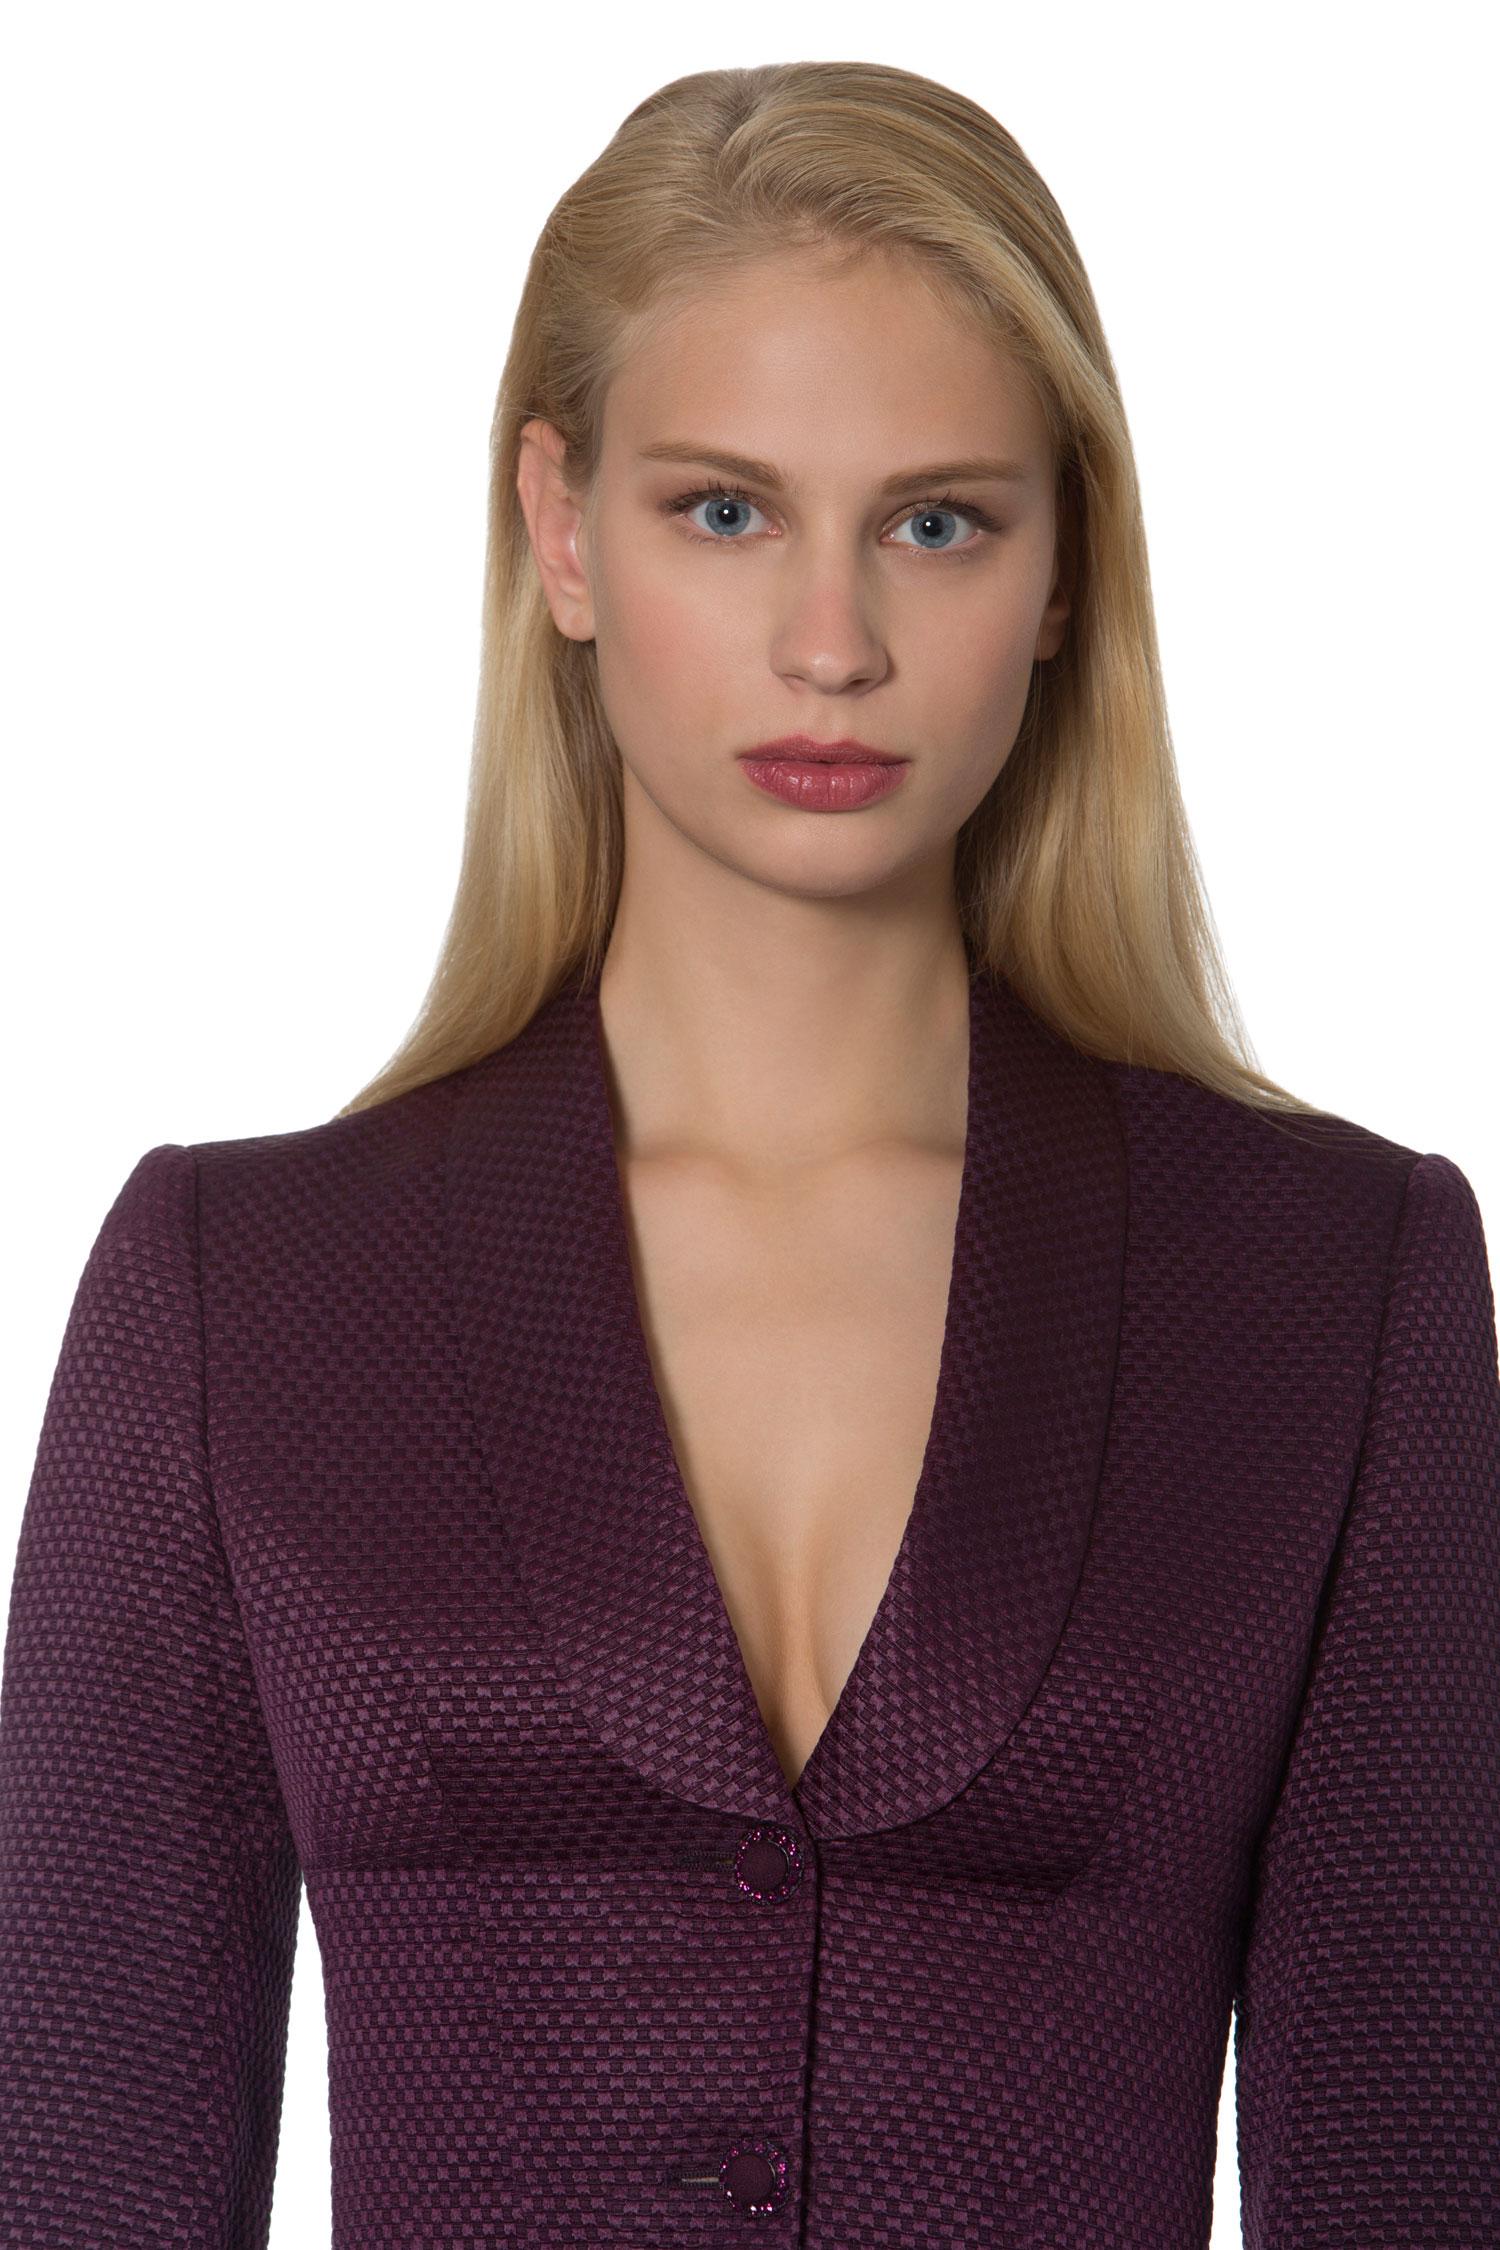 Z-Form-Uniform-Kelsy-Zimba-Jacket-WJ12-detail.jpg